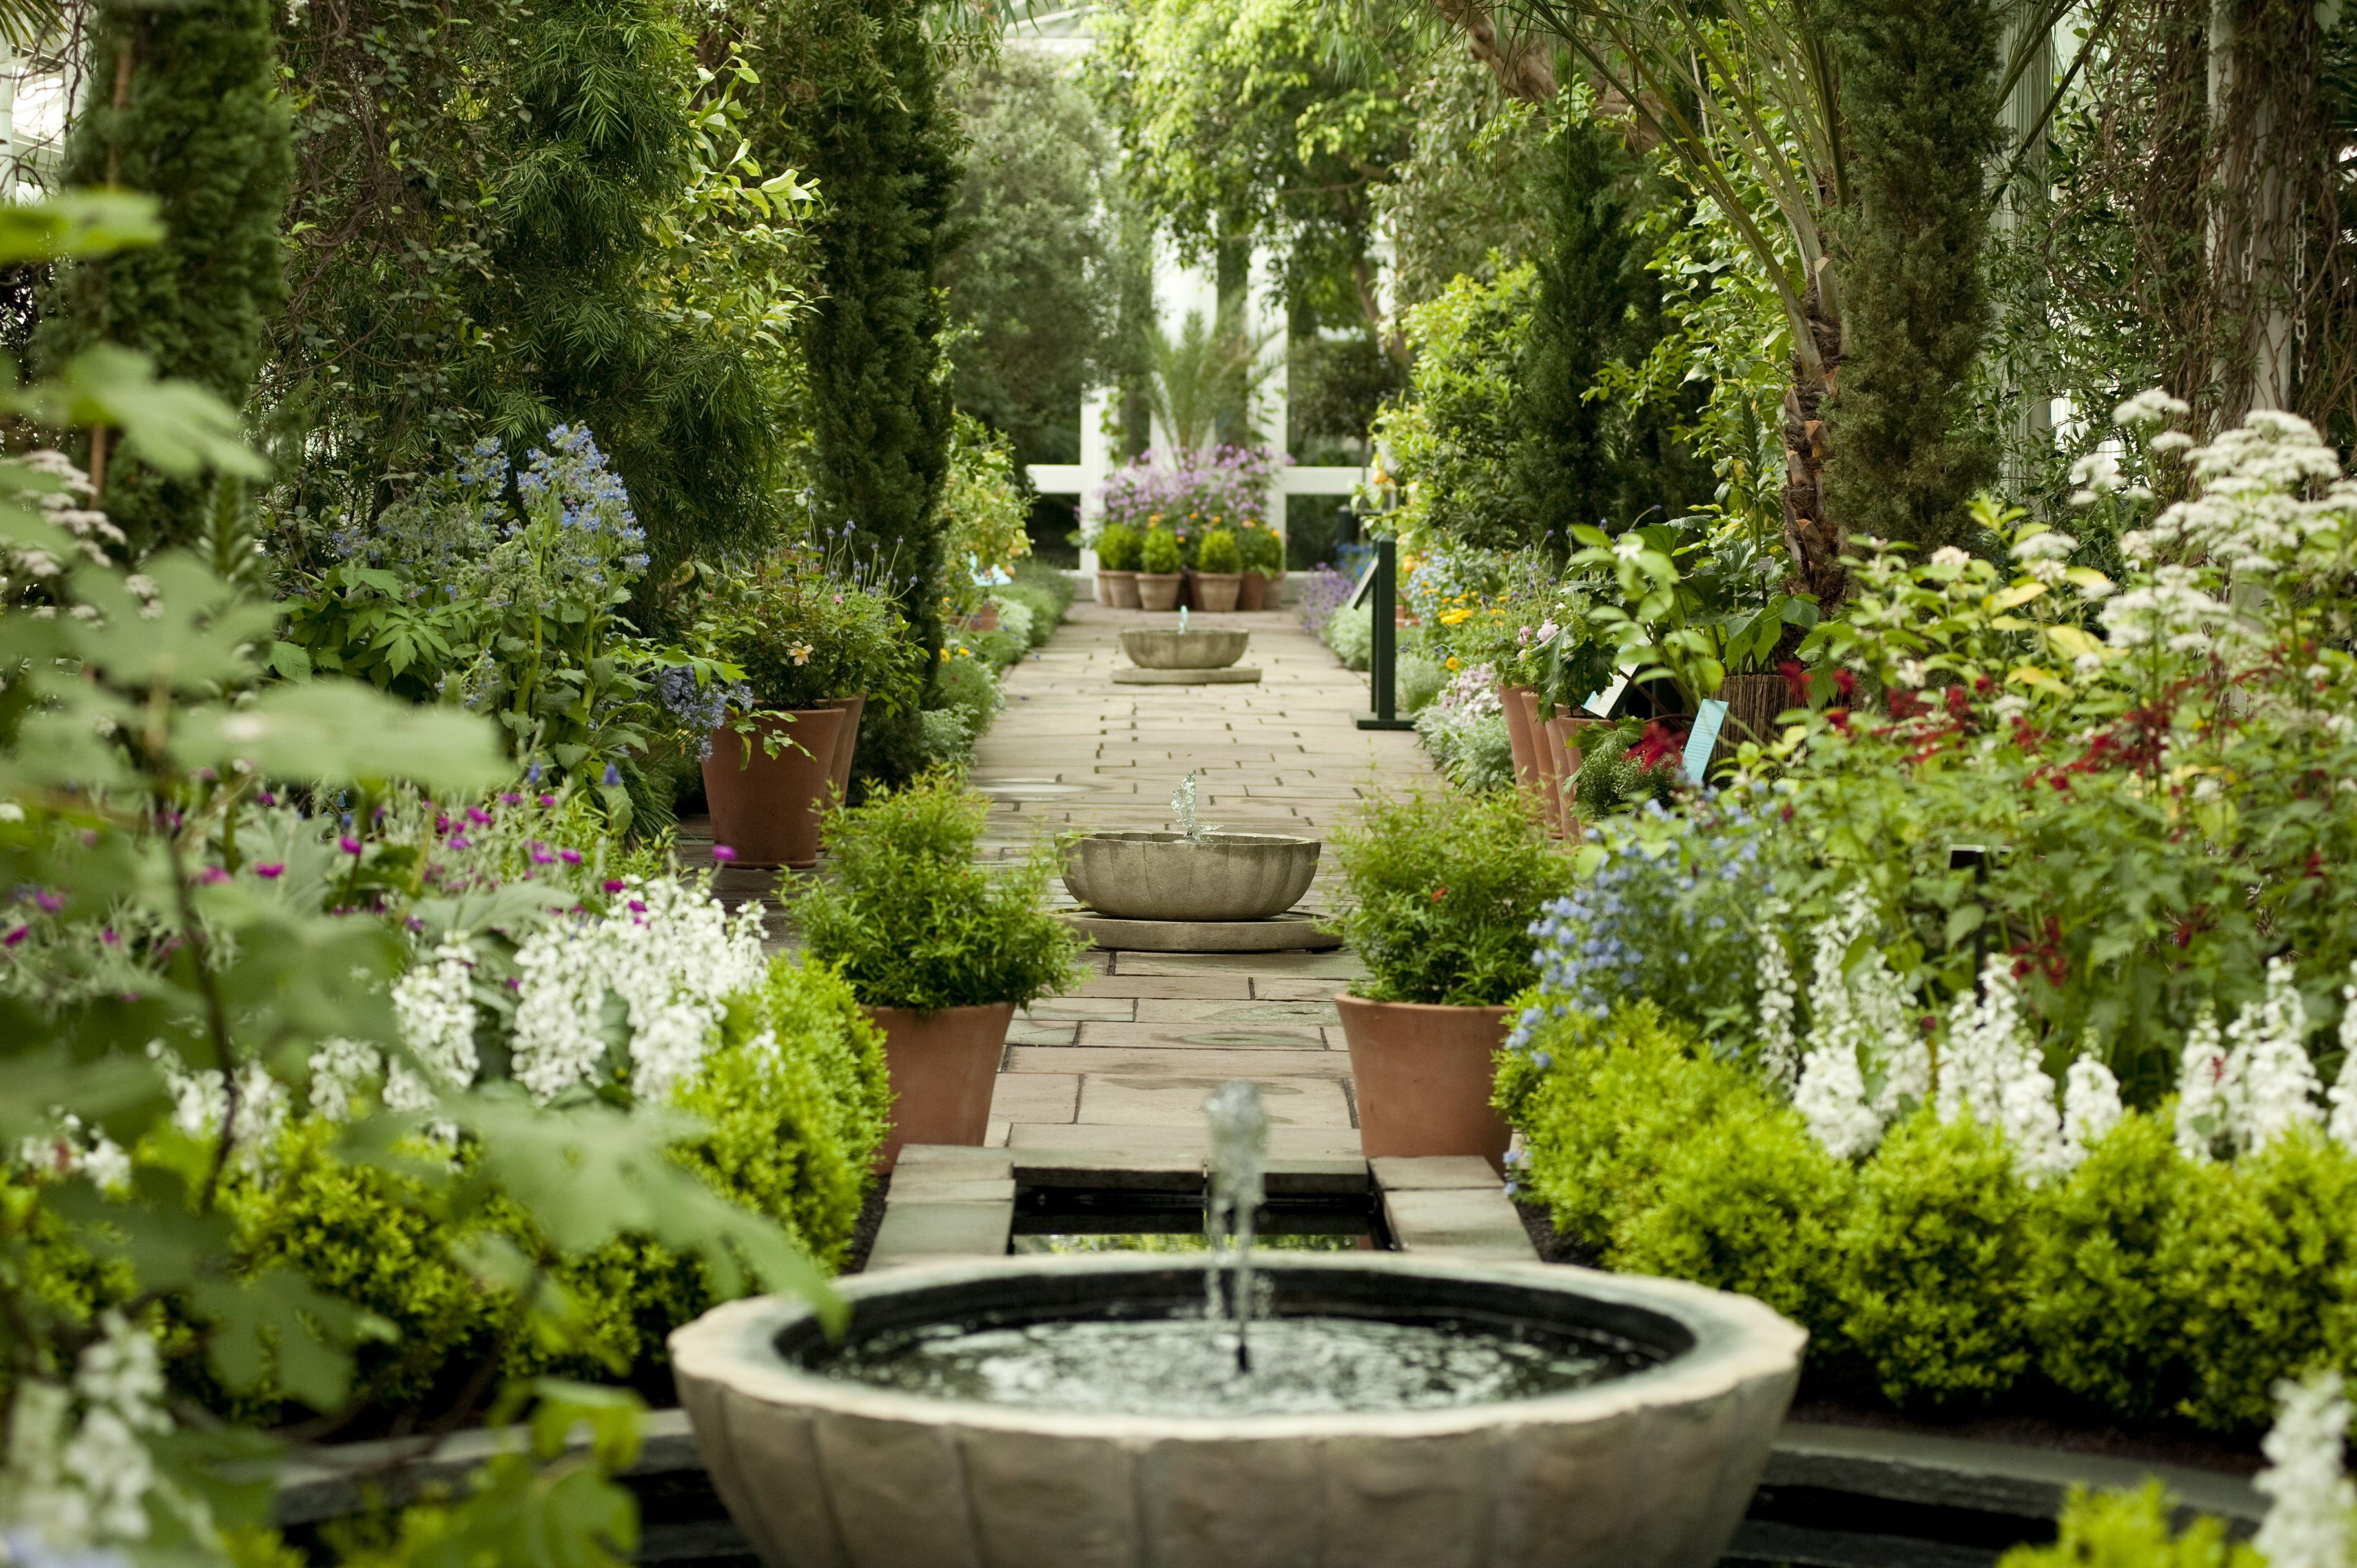 Spanish gardens - Google Search